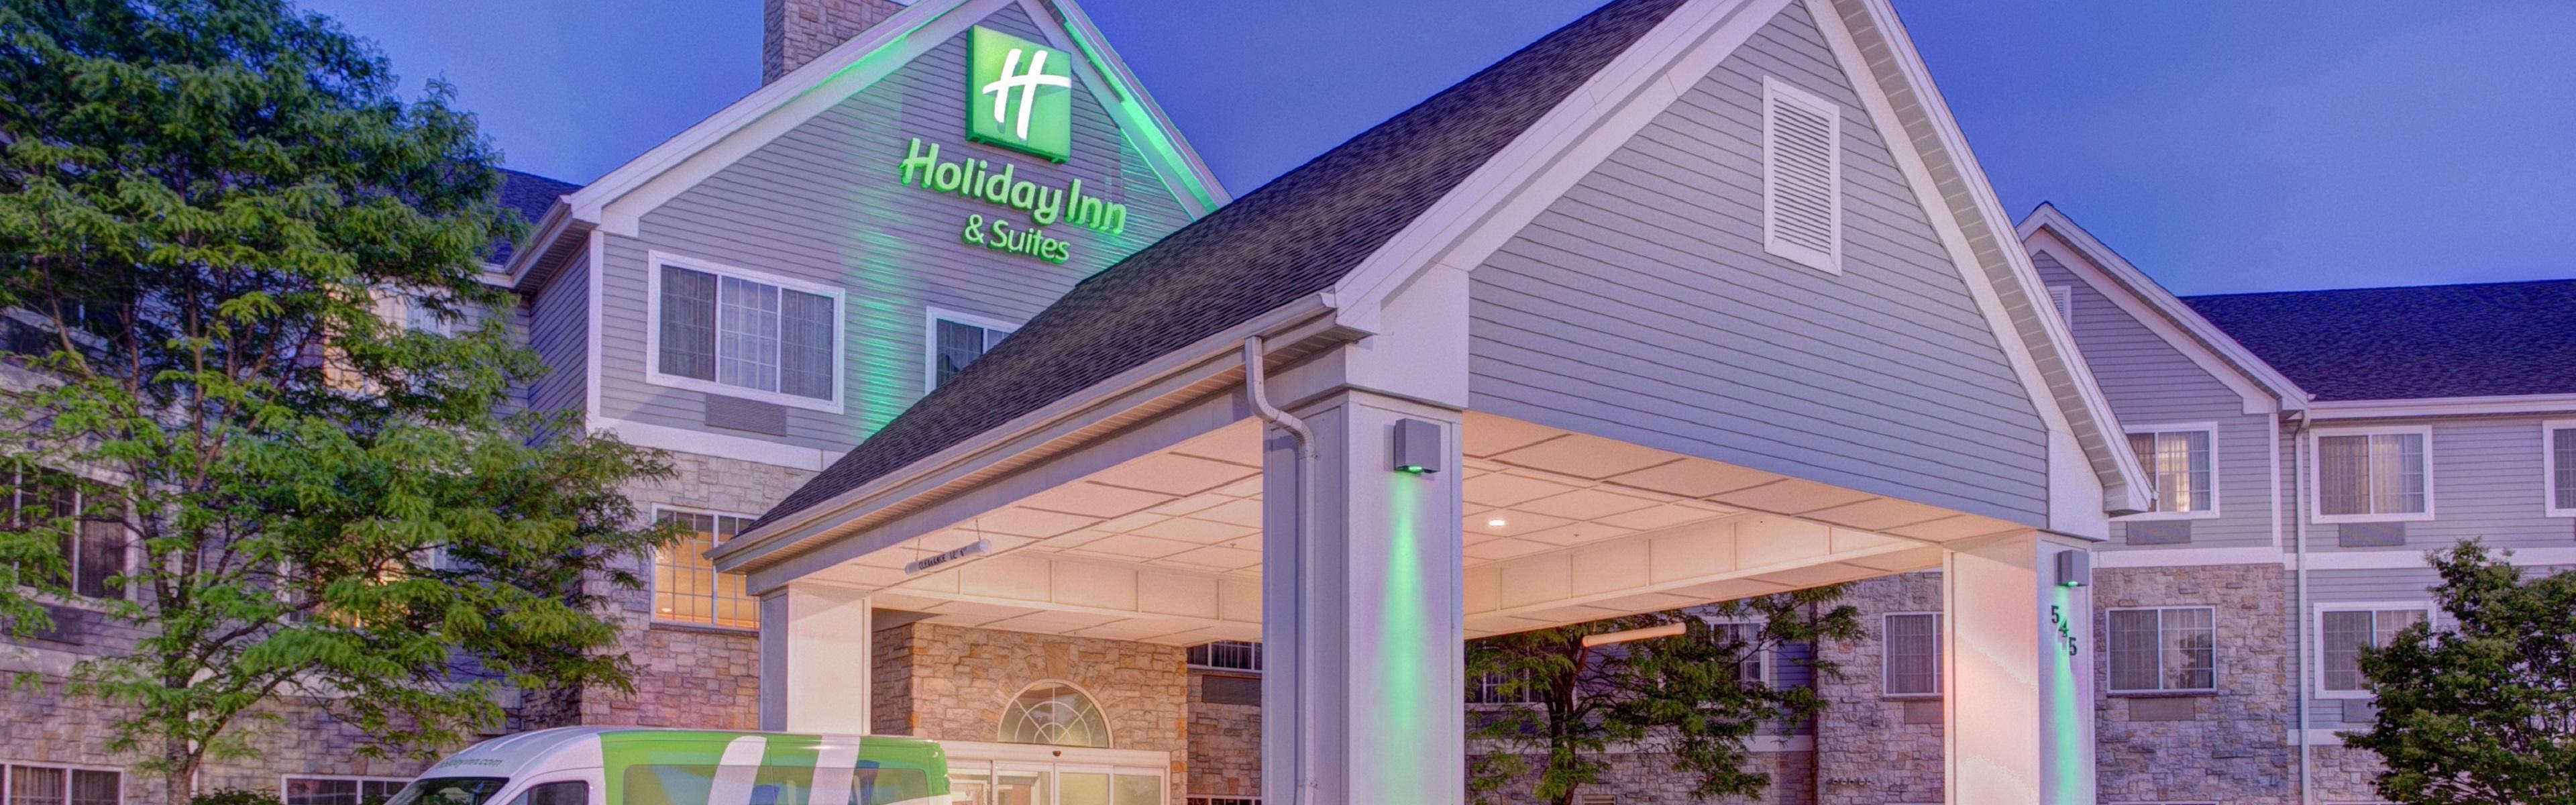 Holiday Inn Milwaukee Airport image 0